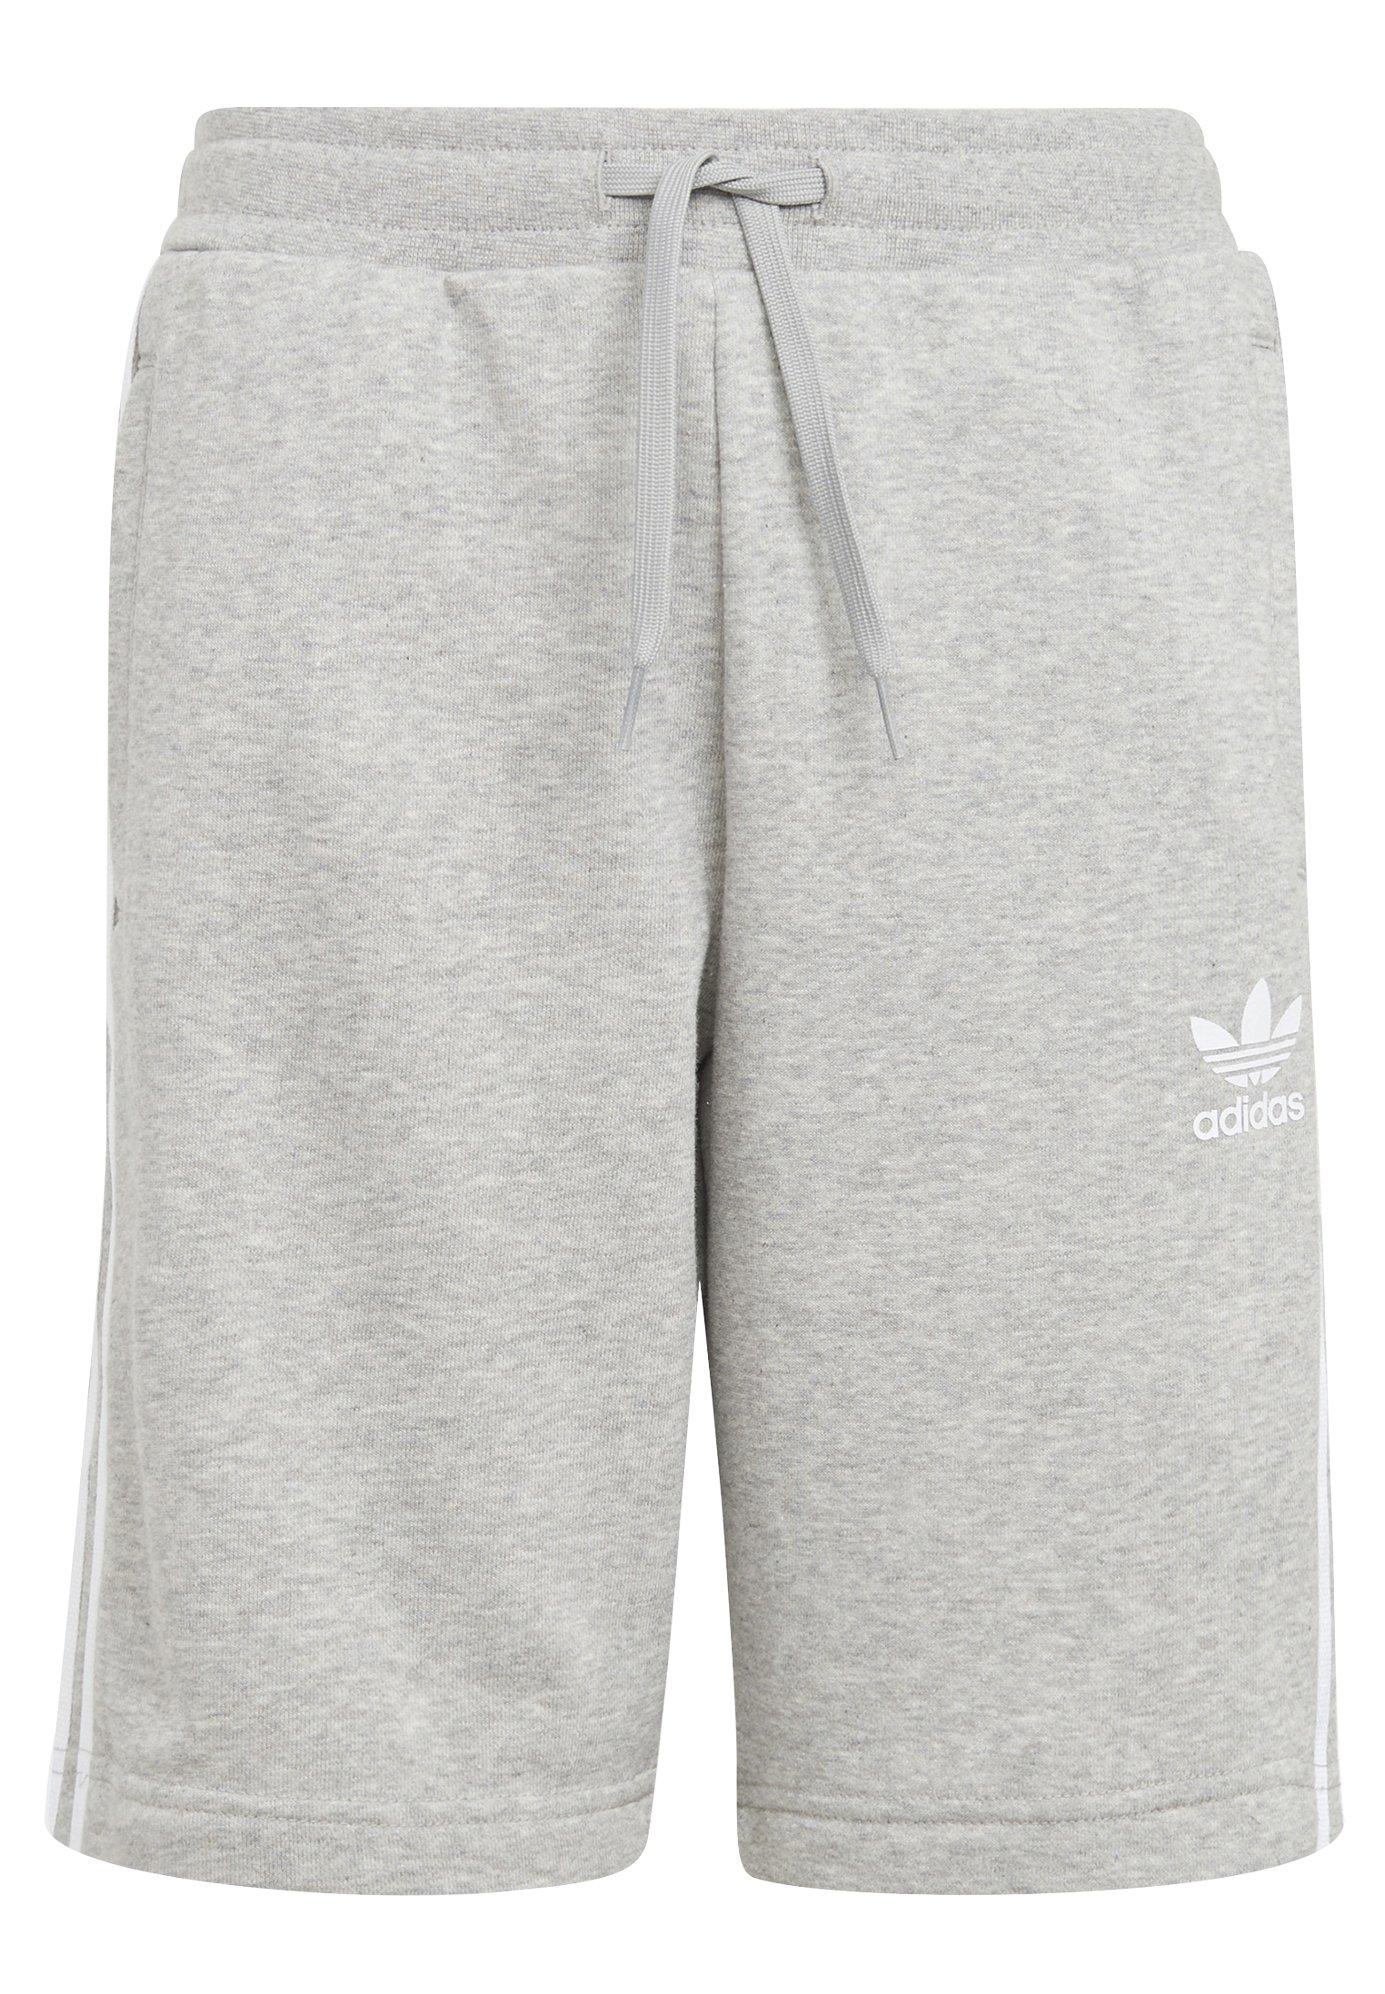 Kids ADICOLOR - Shorts